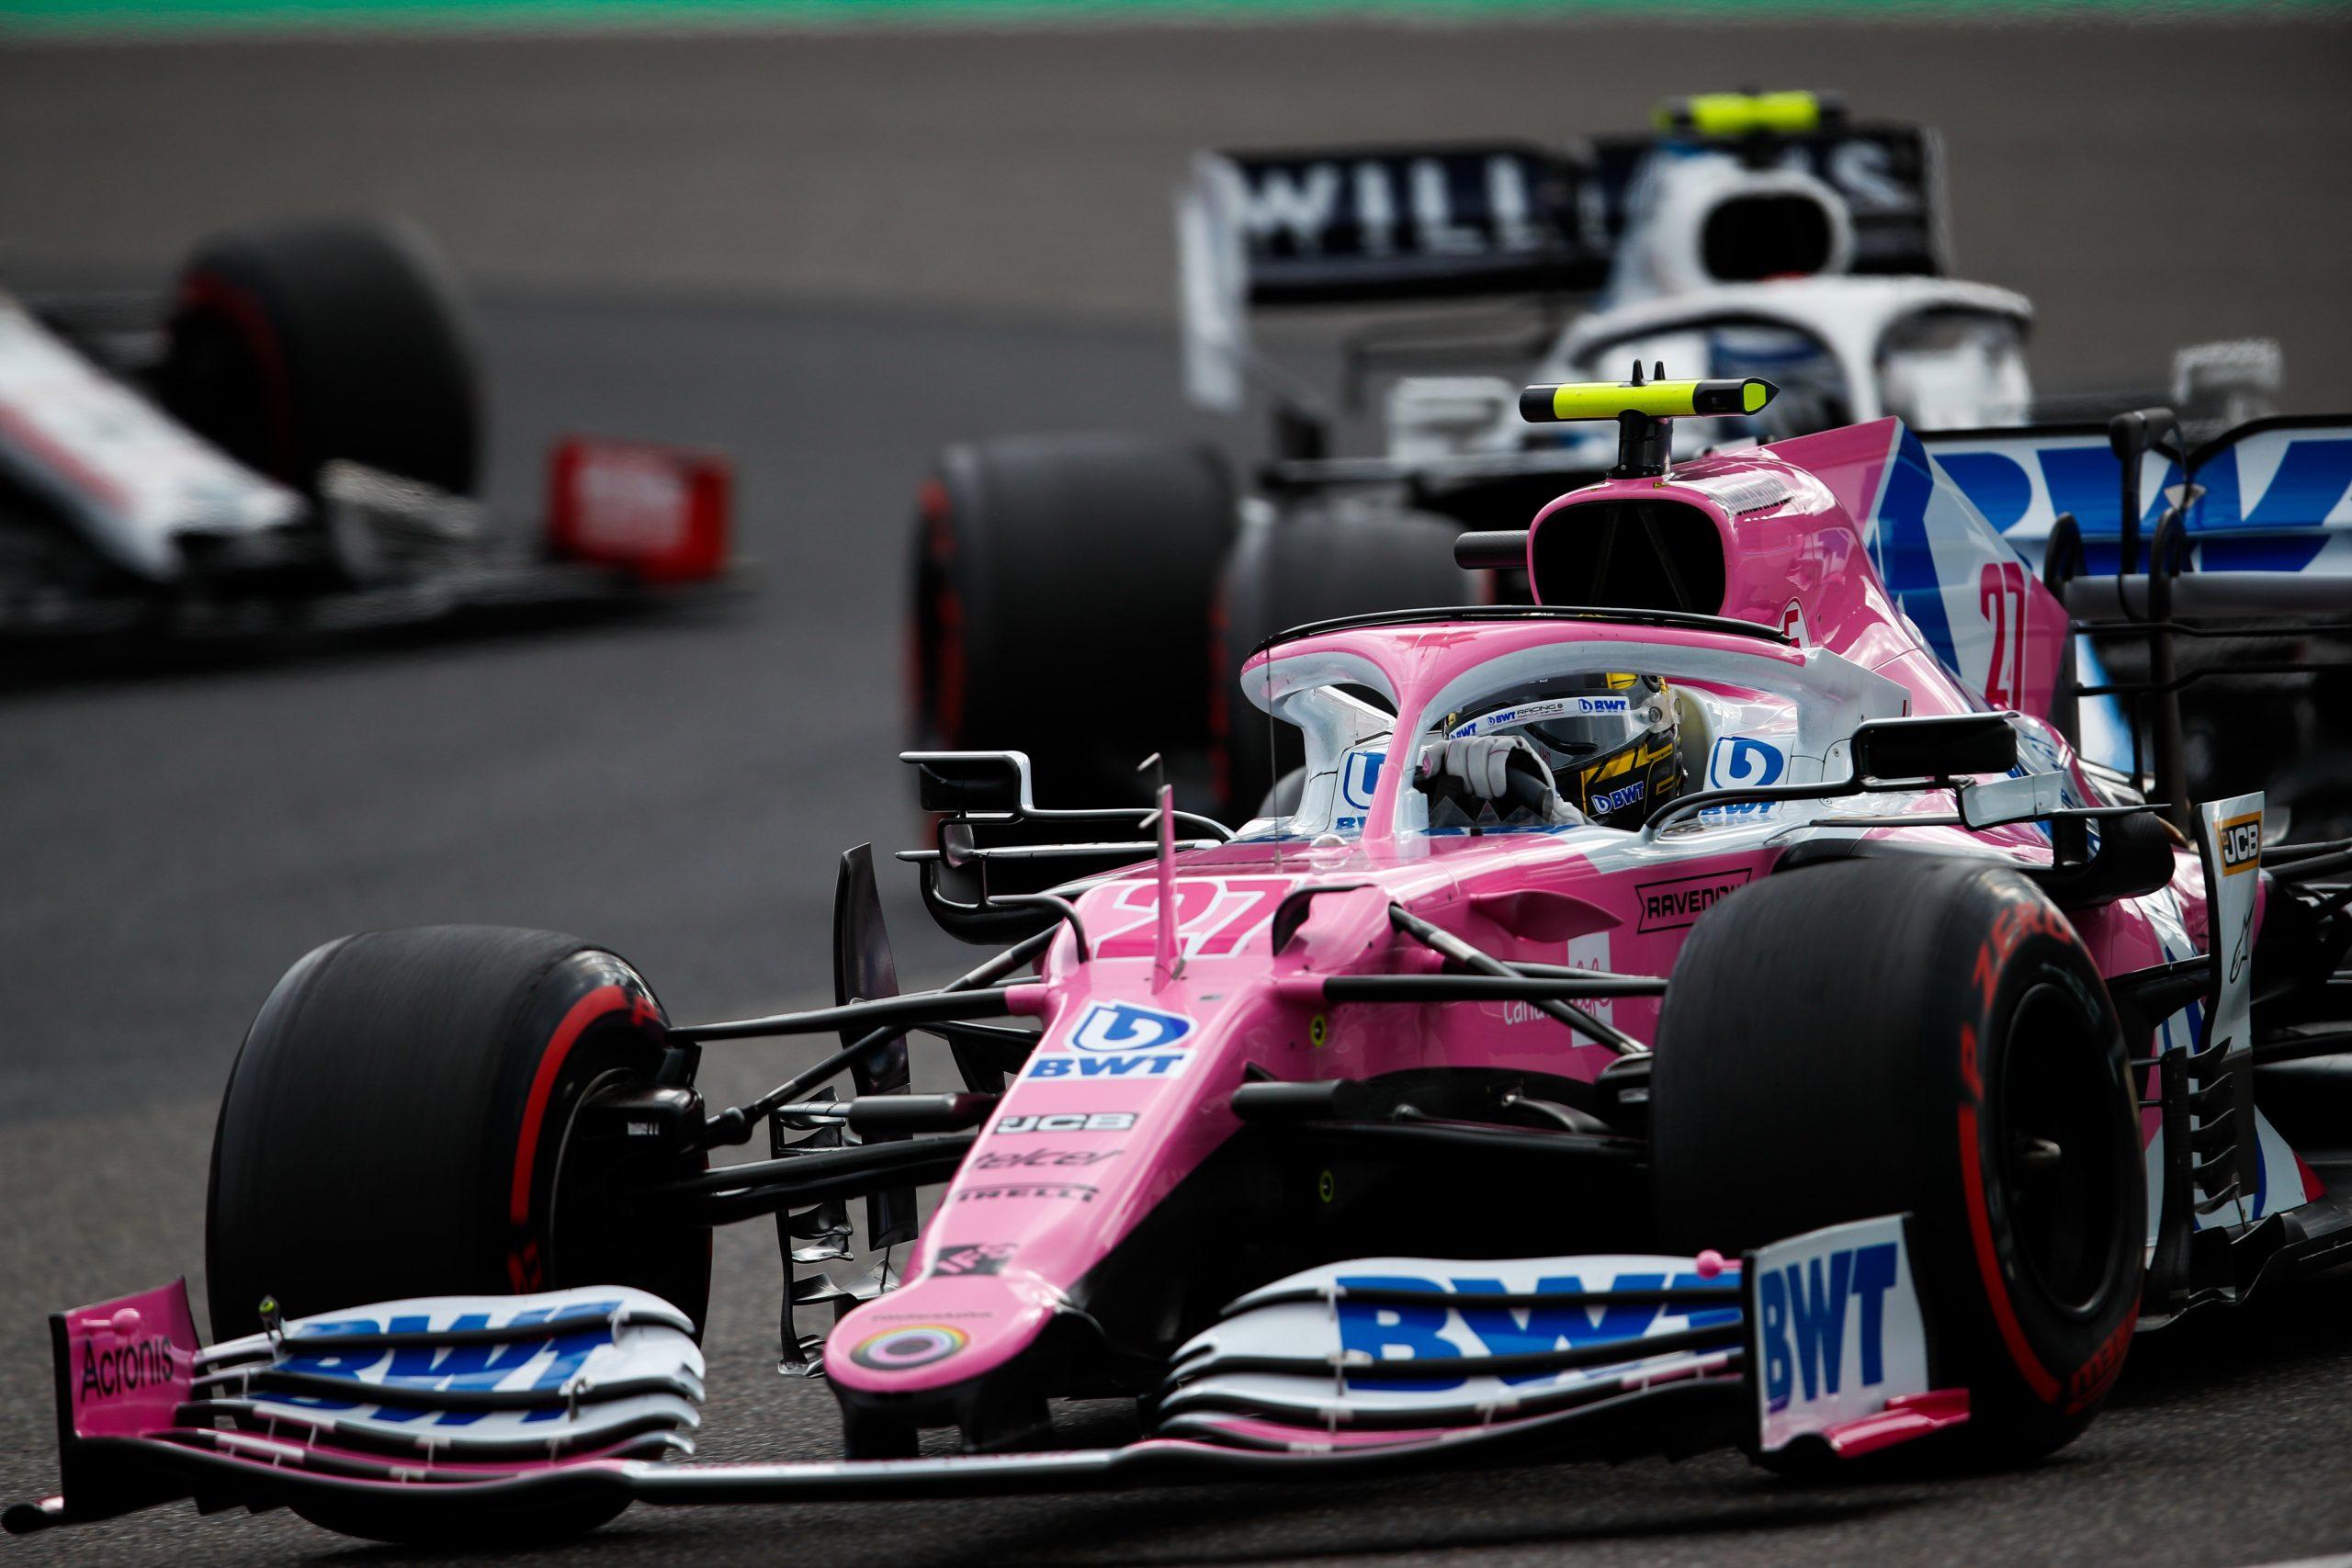 Nico Hulkenberg, Racing Point, Formula 1 Eifel Grand Prix 2020